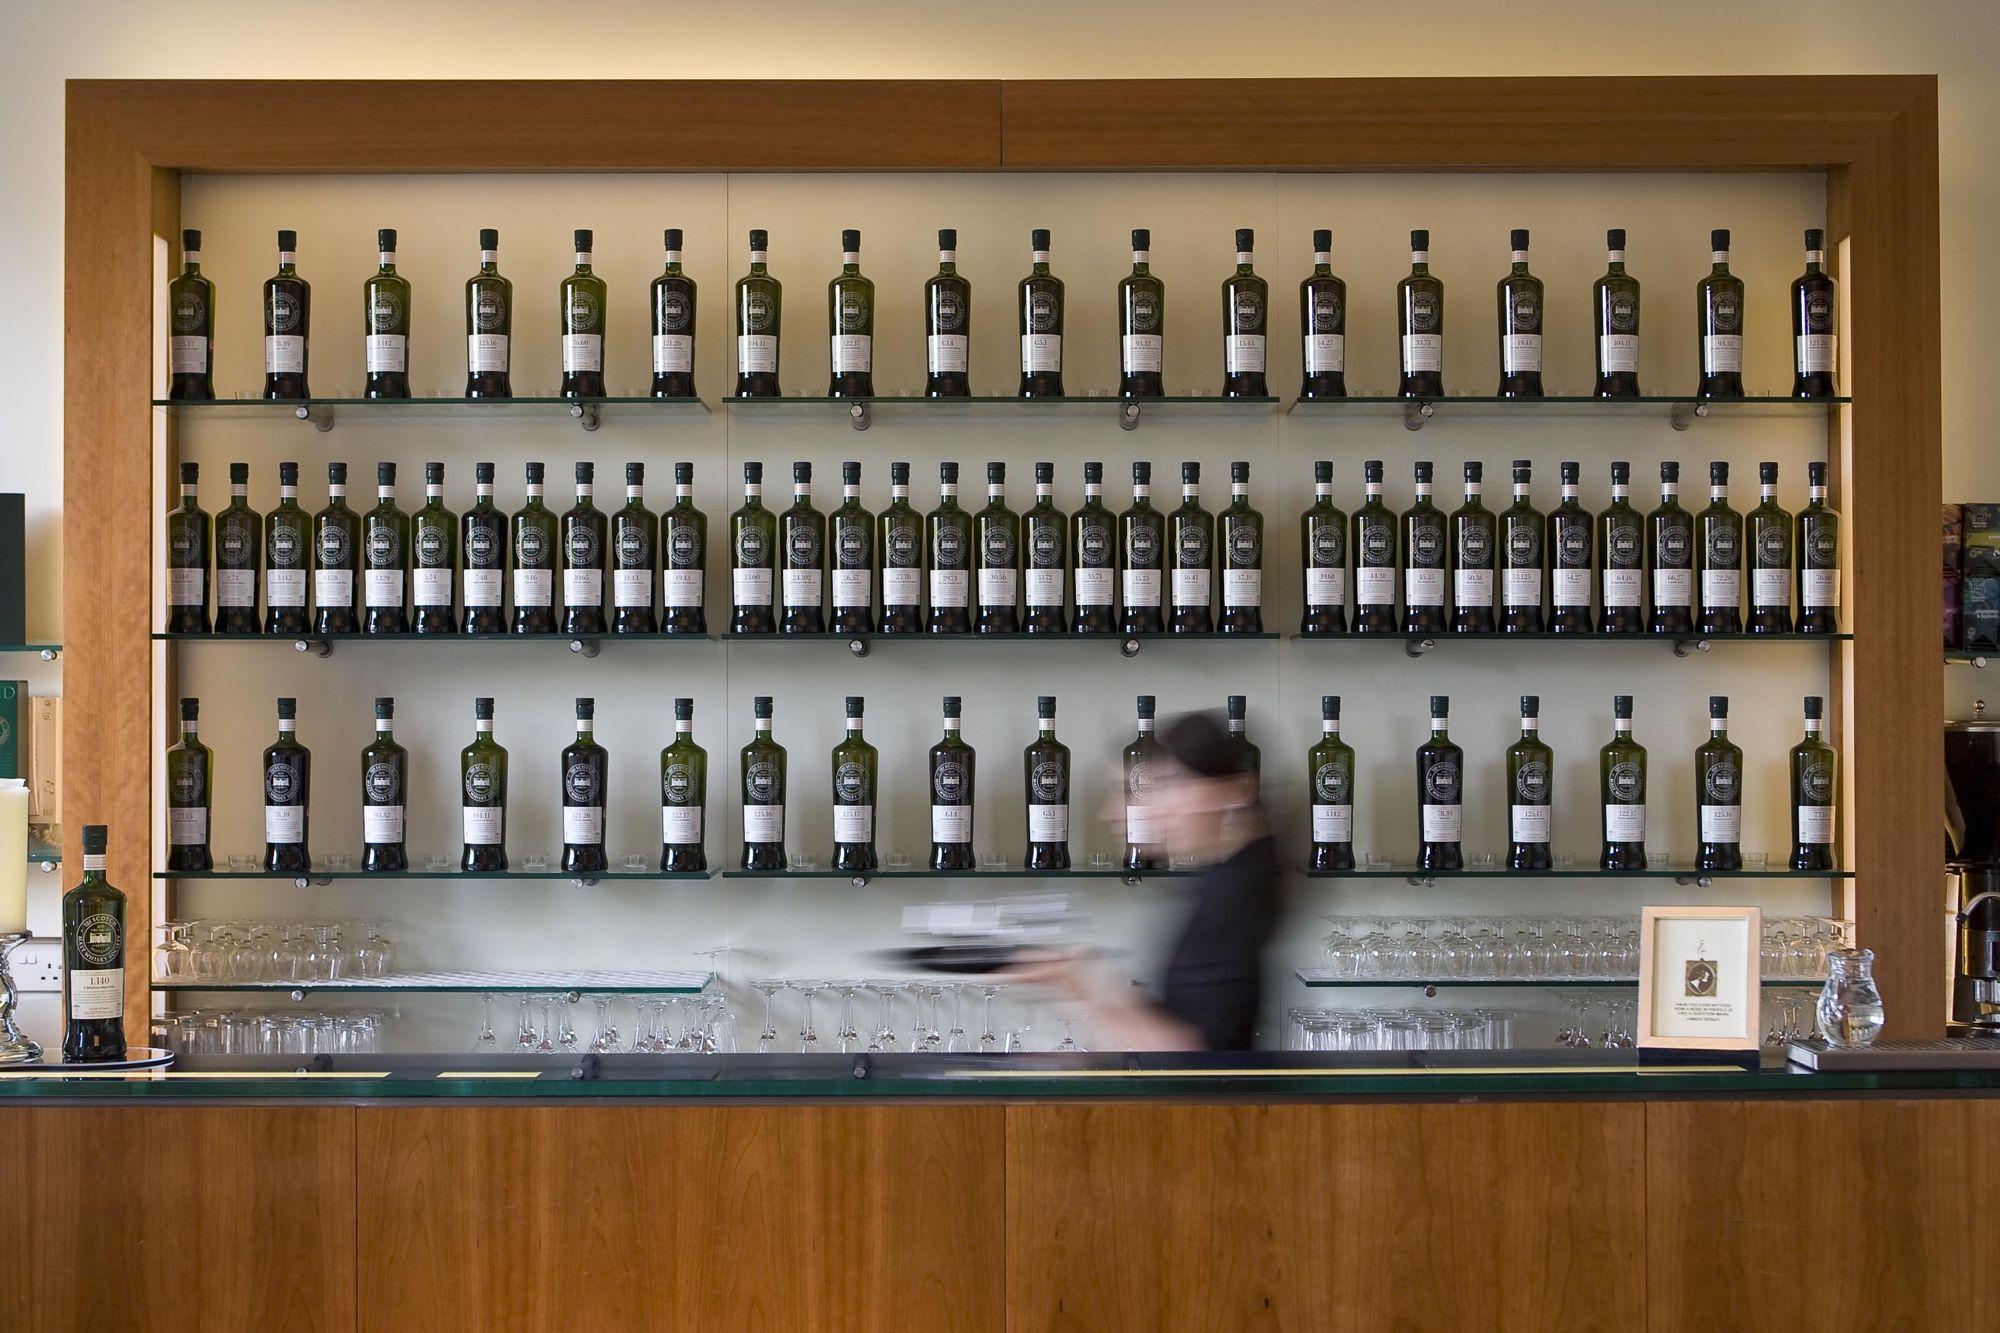 Dining Room at the Scotch Malt Whisky Society